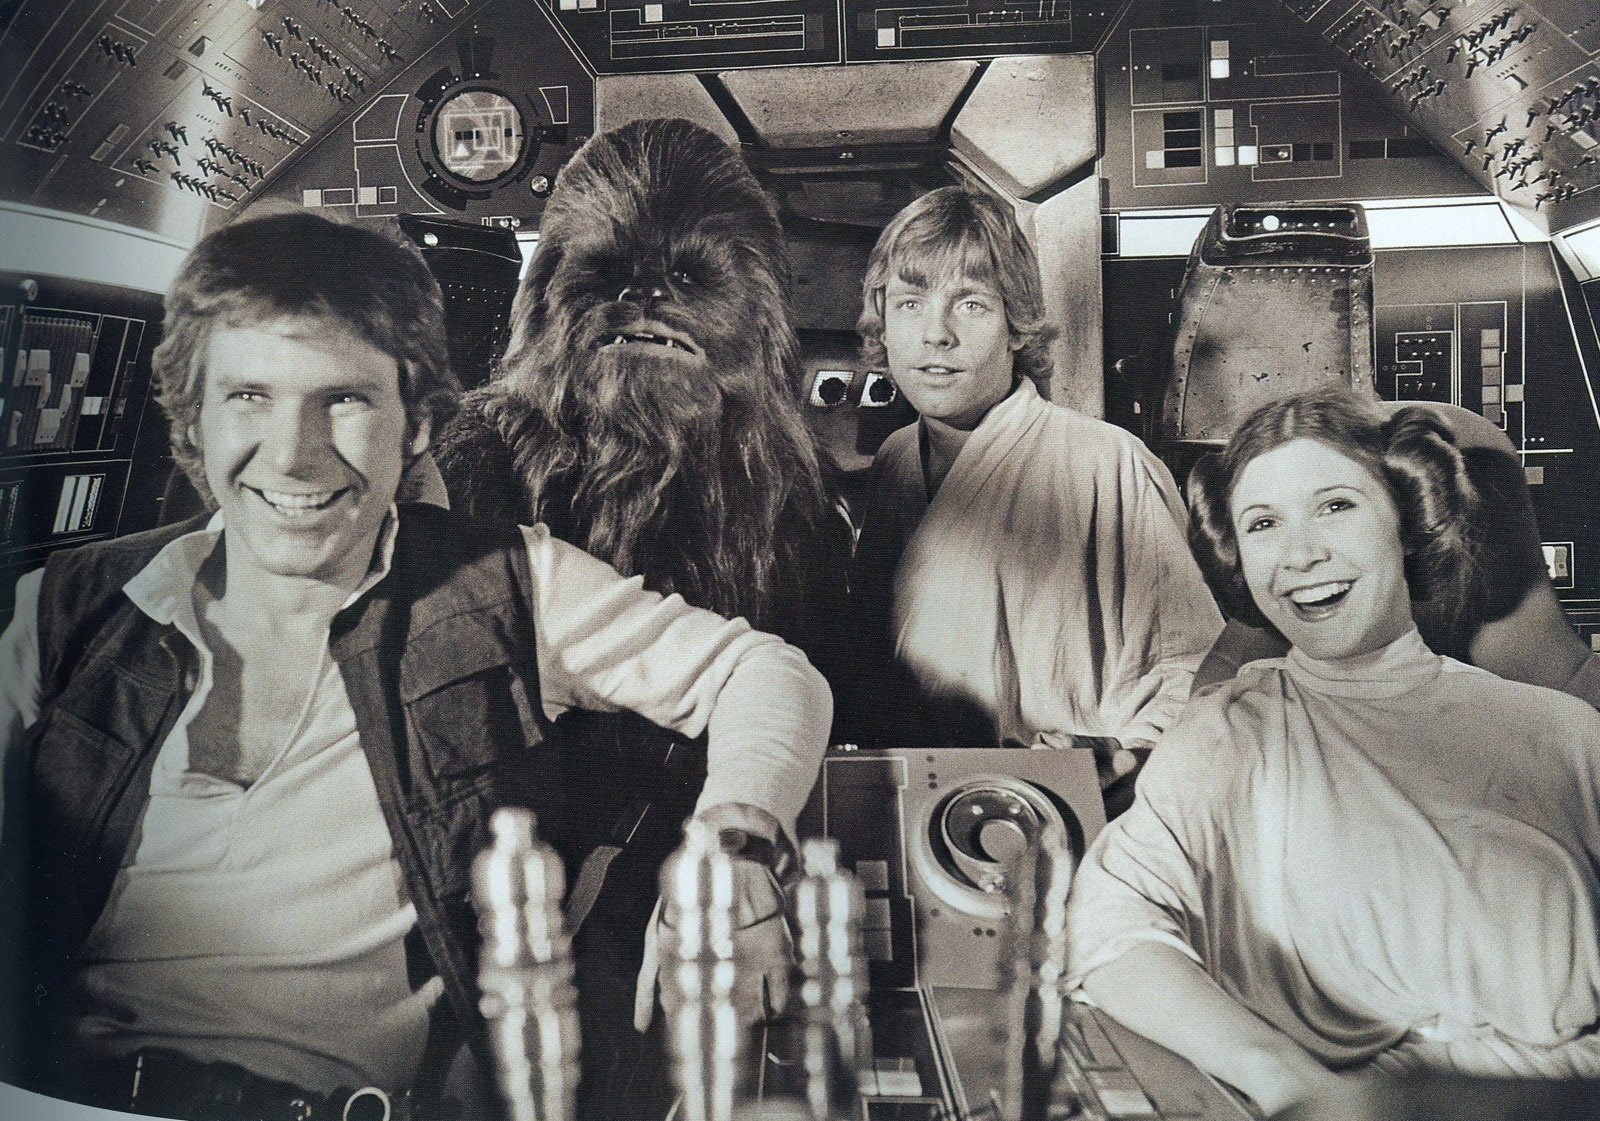 Chewie-Luke-Leia-and-Han-han-luke-and-leia-24048896-1600-1121